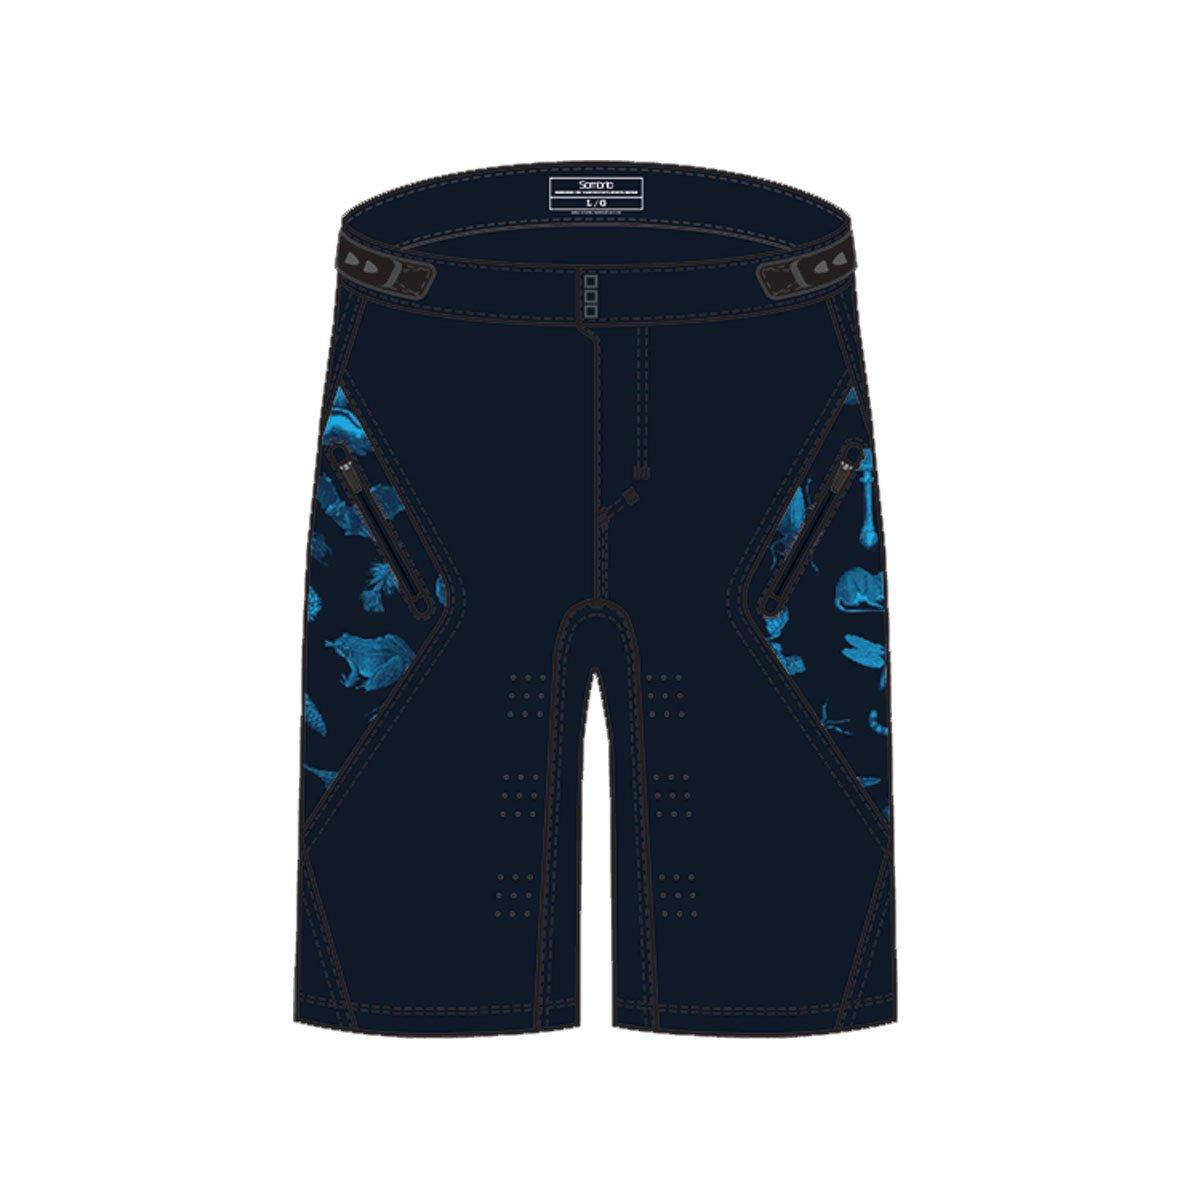 Sombrio 2018 Men 's Highline Cycling Shorts – b360040 m B074V7FNJR Small|Dark Night Forest Creatures Dark Night Forest Creatures Small